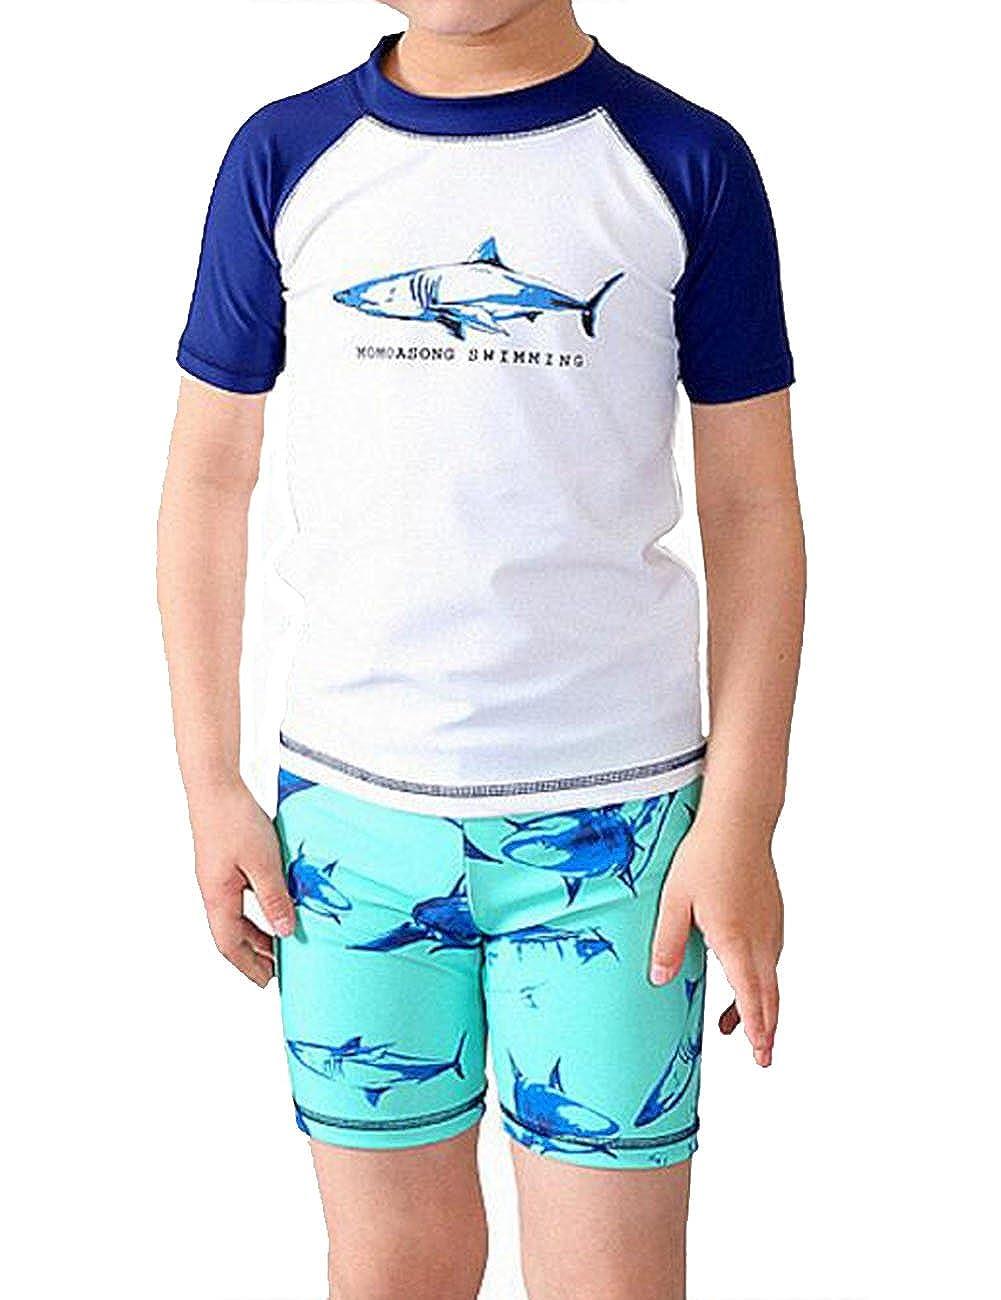 Summer Kids Boys Shark Rash Guard Swimsuit Set Beach Wear with Cap F276